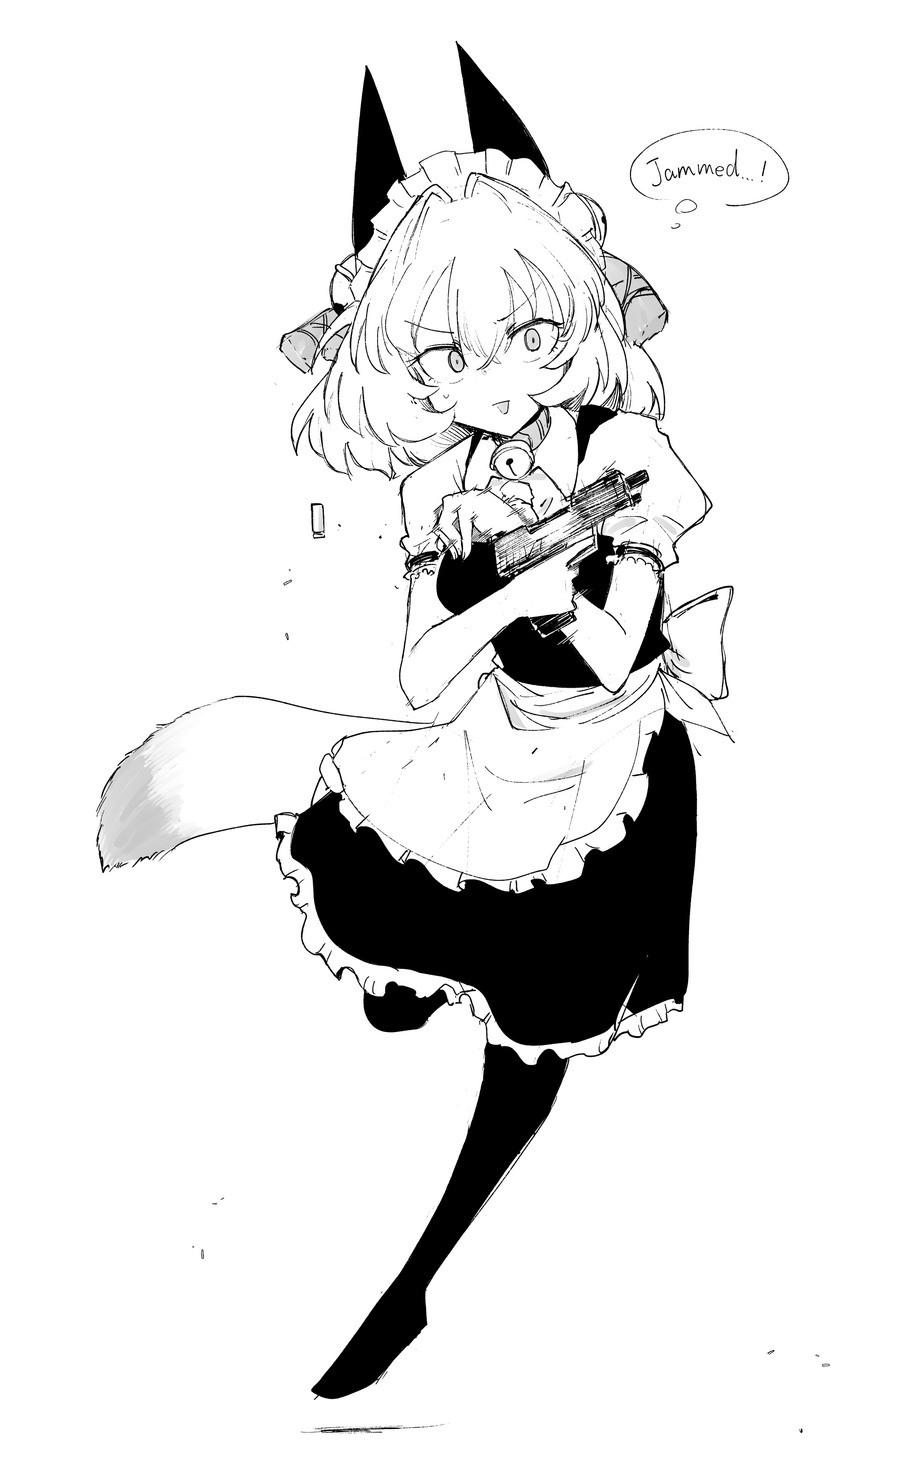 Maid. .. Cptbajusz Itssakamoto